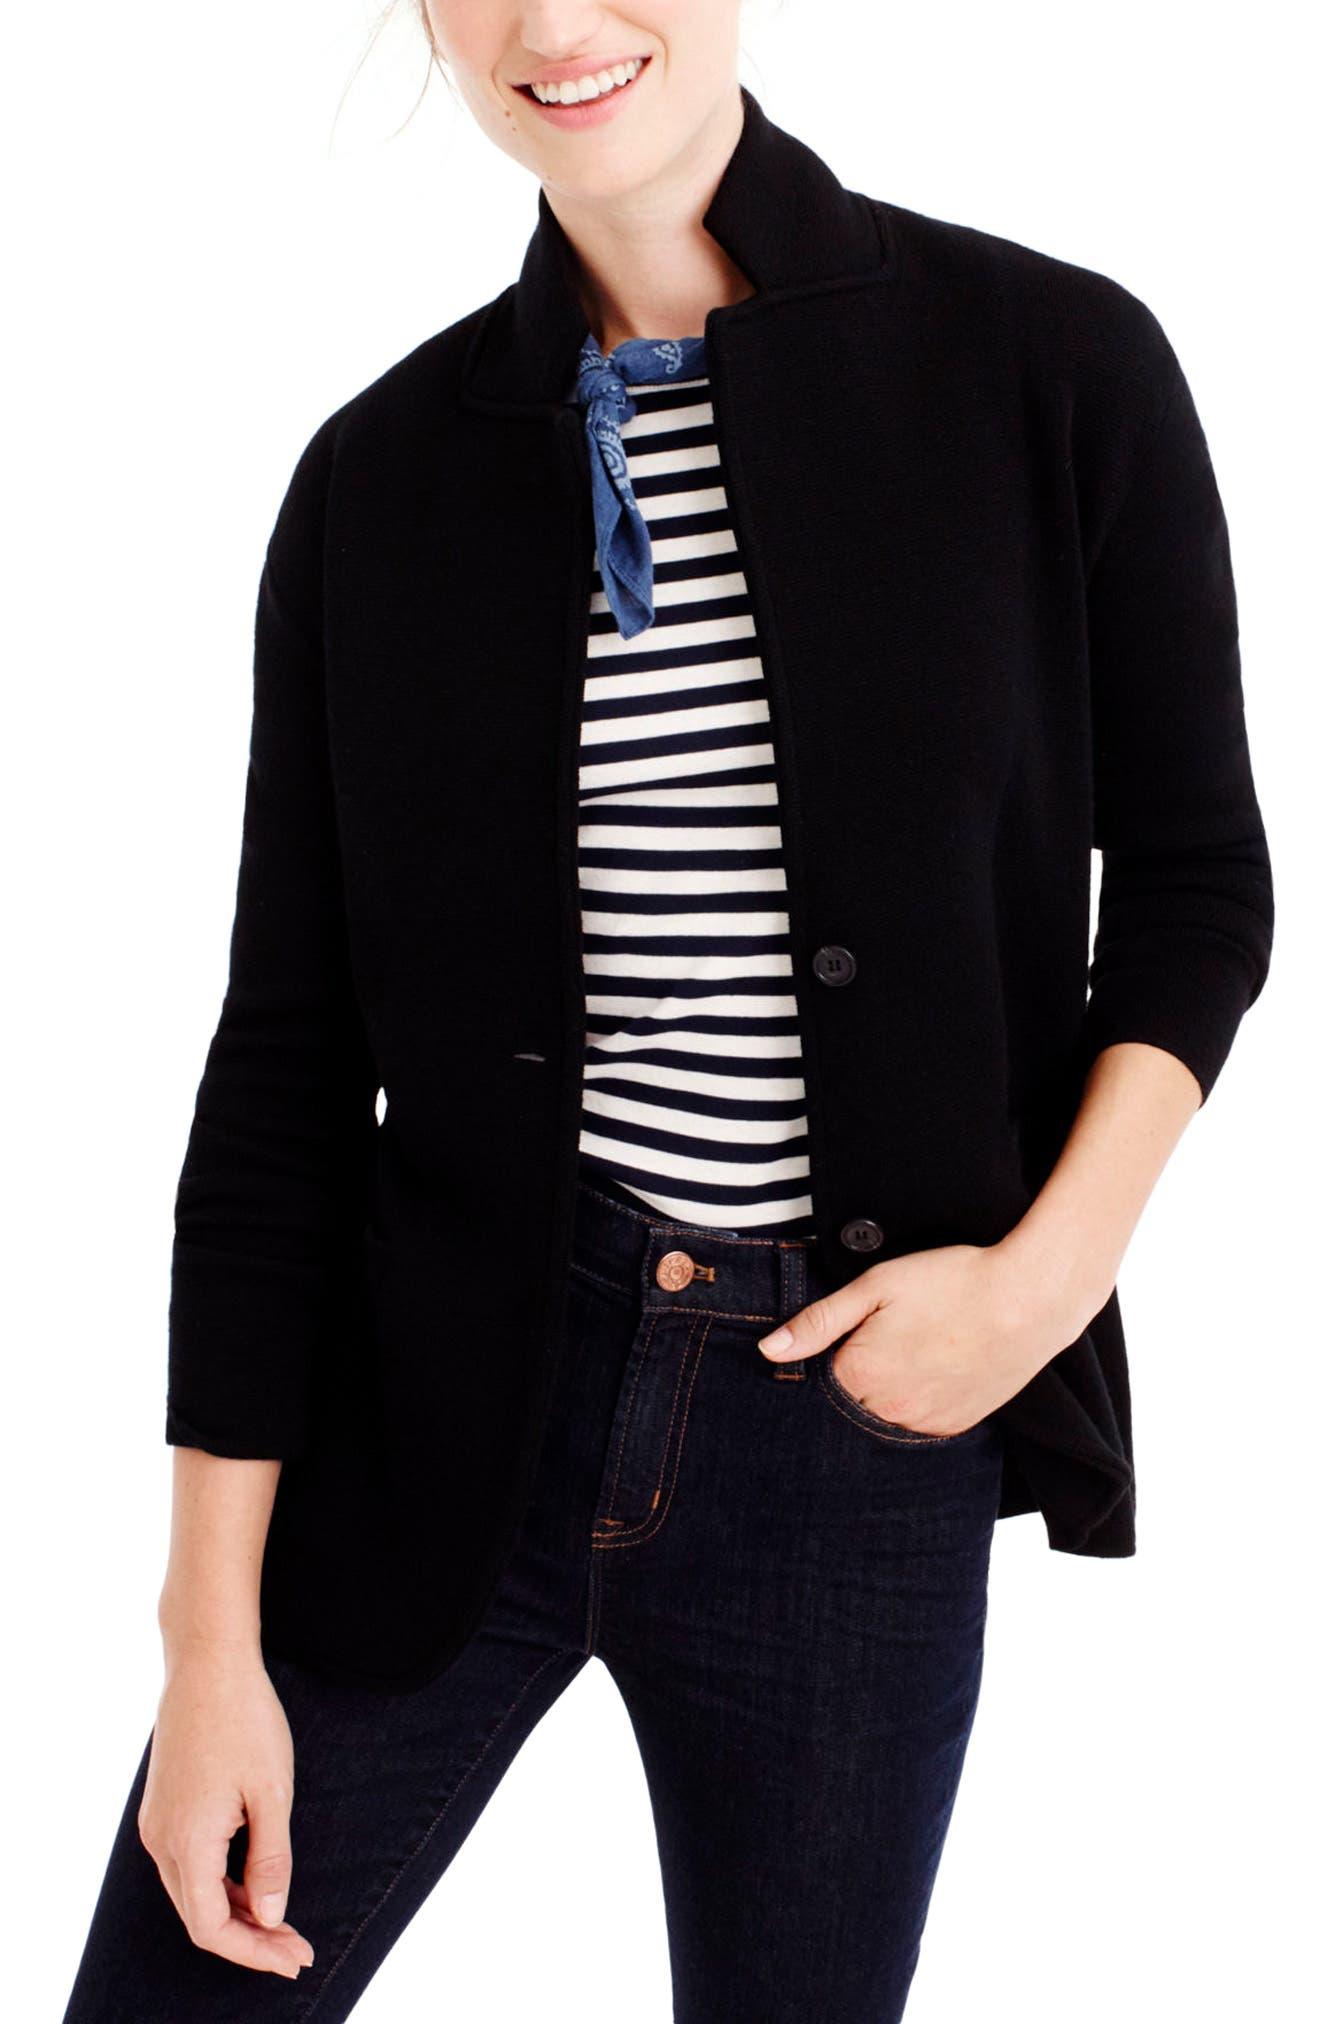 Alternate Image 1 Selected - J.Crew Merino Wool Sweater Blazer